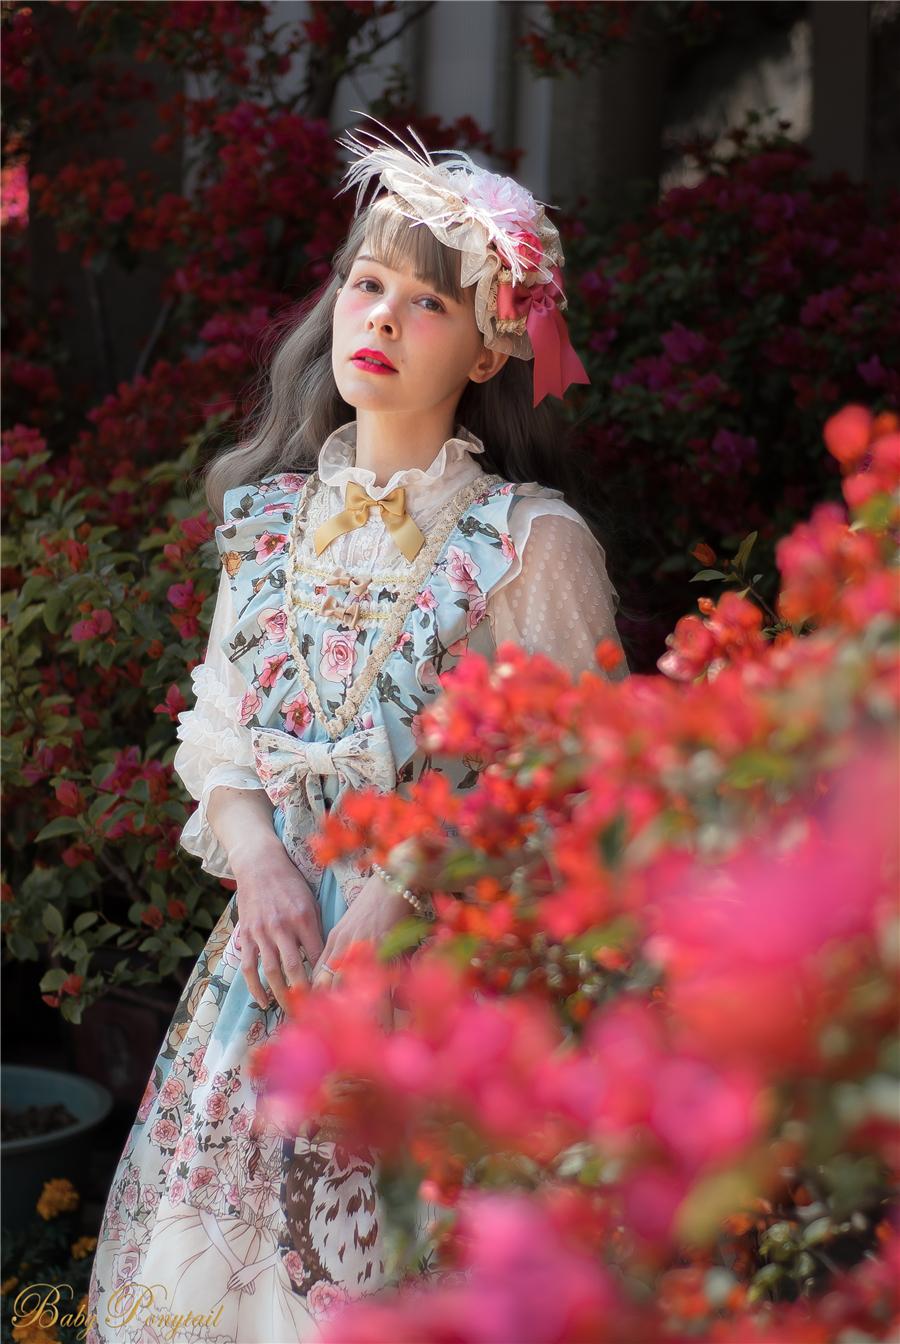 Baby Ponytail_Model Photo_Polly's Garden of Dreams_JSK Sky_Claudia23.jpg